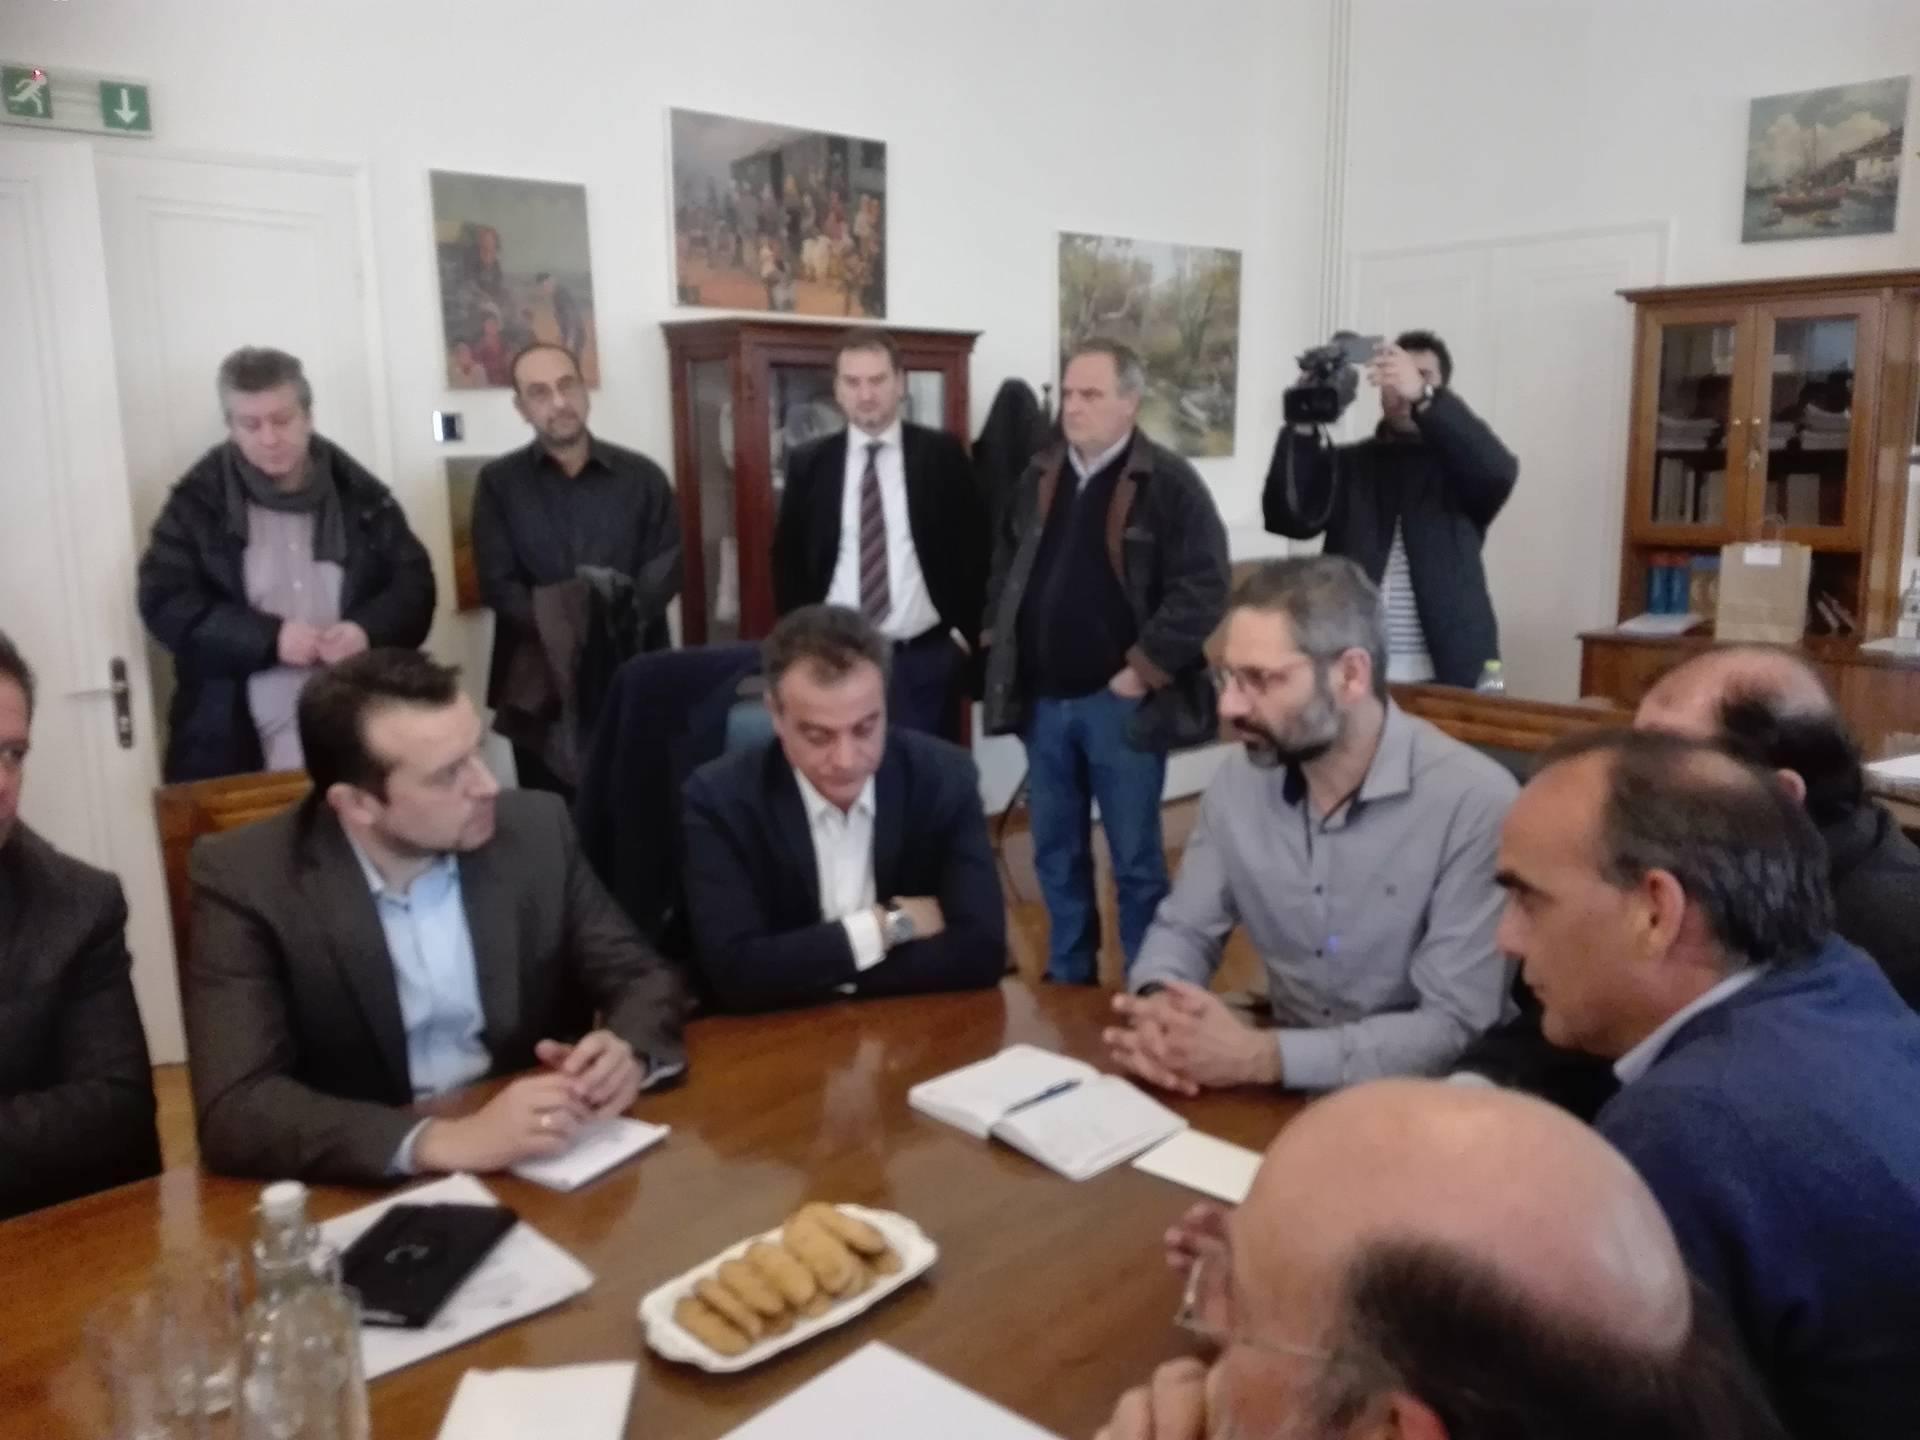 kozan.gr: Στο δημαρχείο Κοζάνης ο Υπουργός Νίκος Παππάς – Τι συζήτησε με το δήμαρχο Κοζάνης (Φωτογραφίες & Βίντεο)